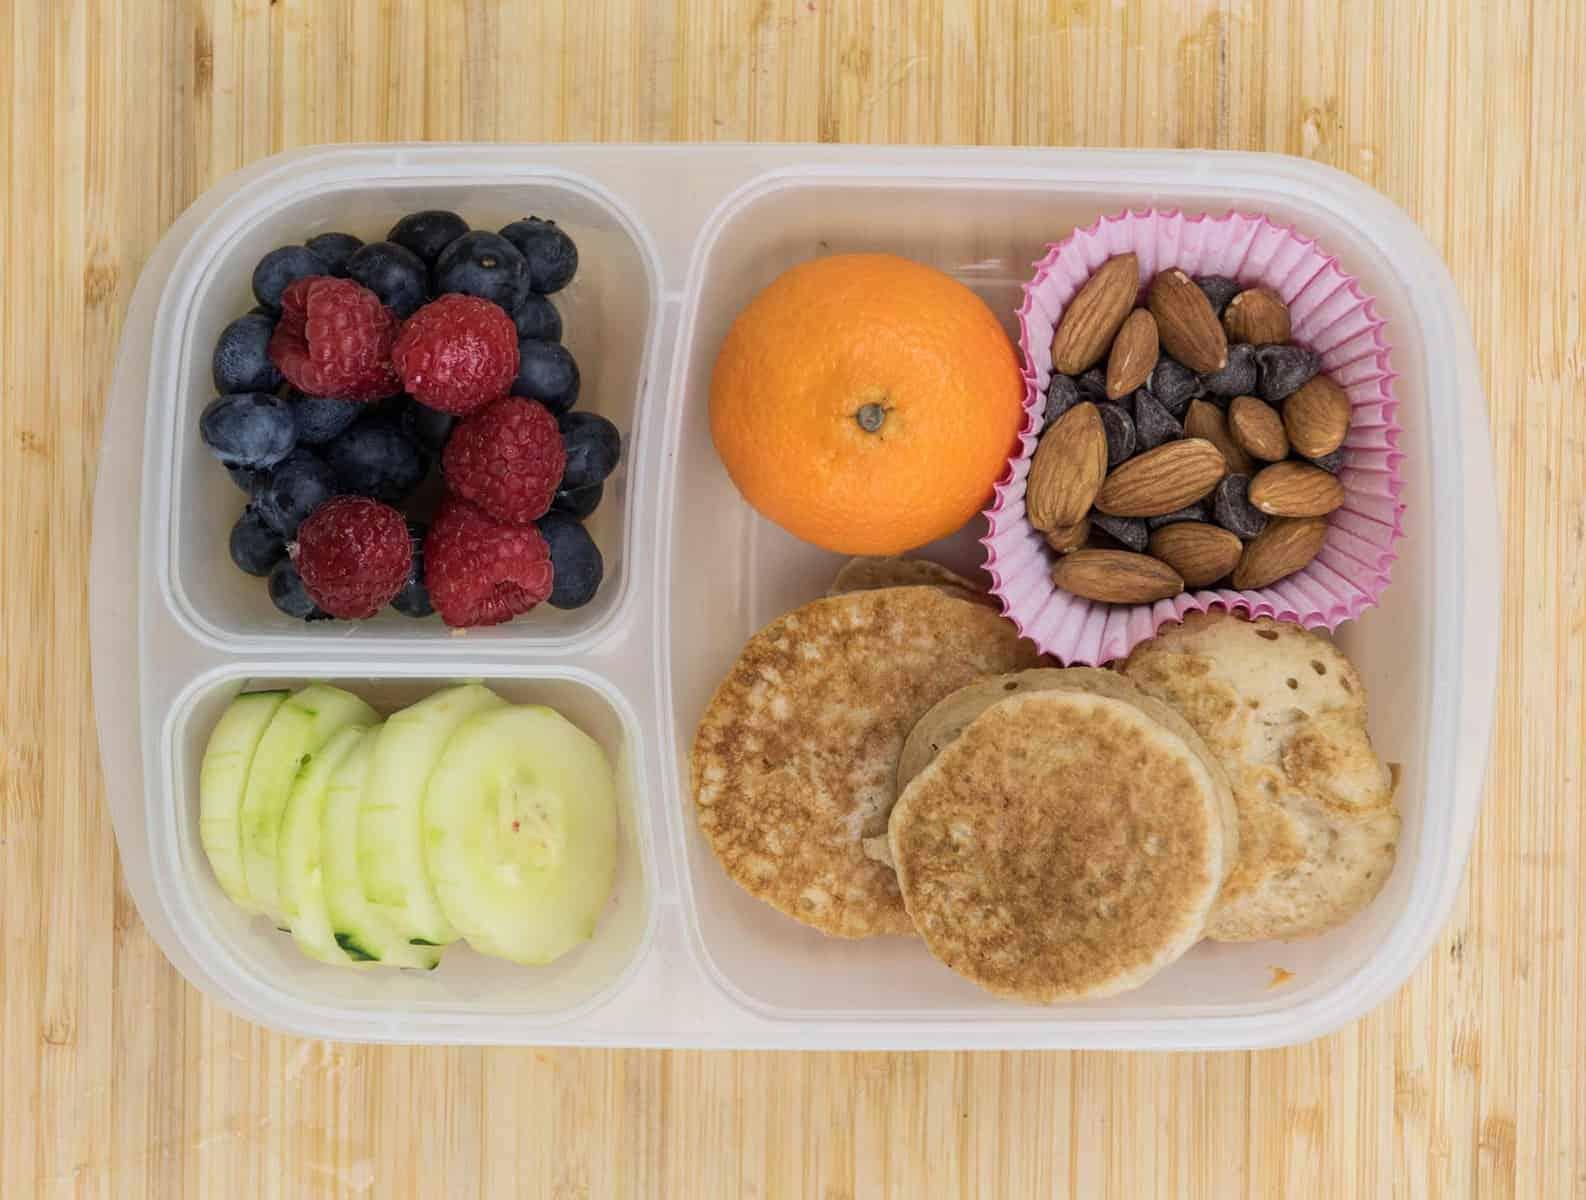 Lunch Box Ideas - Pancake Sandwich Lunch Box